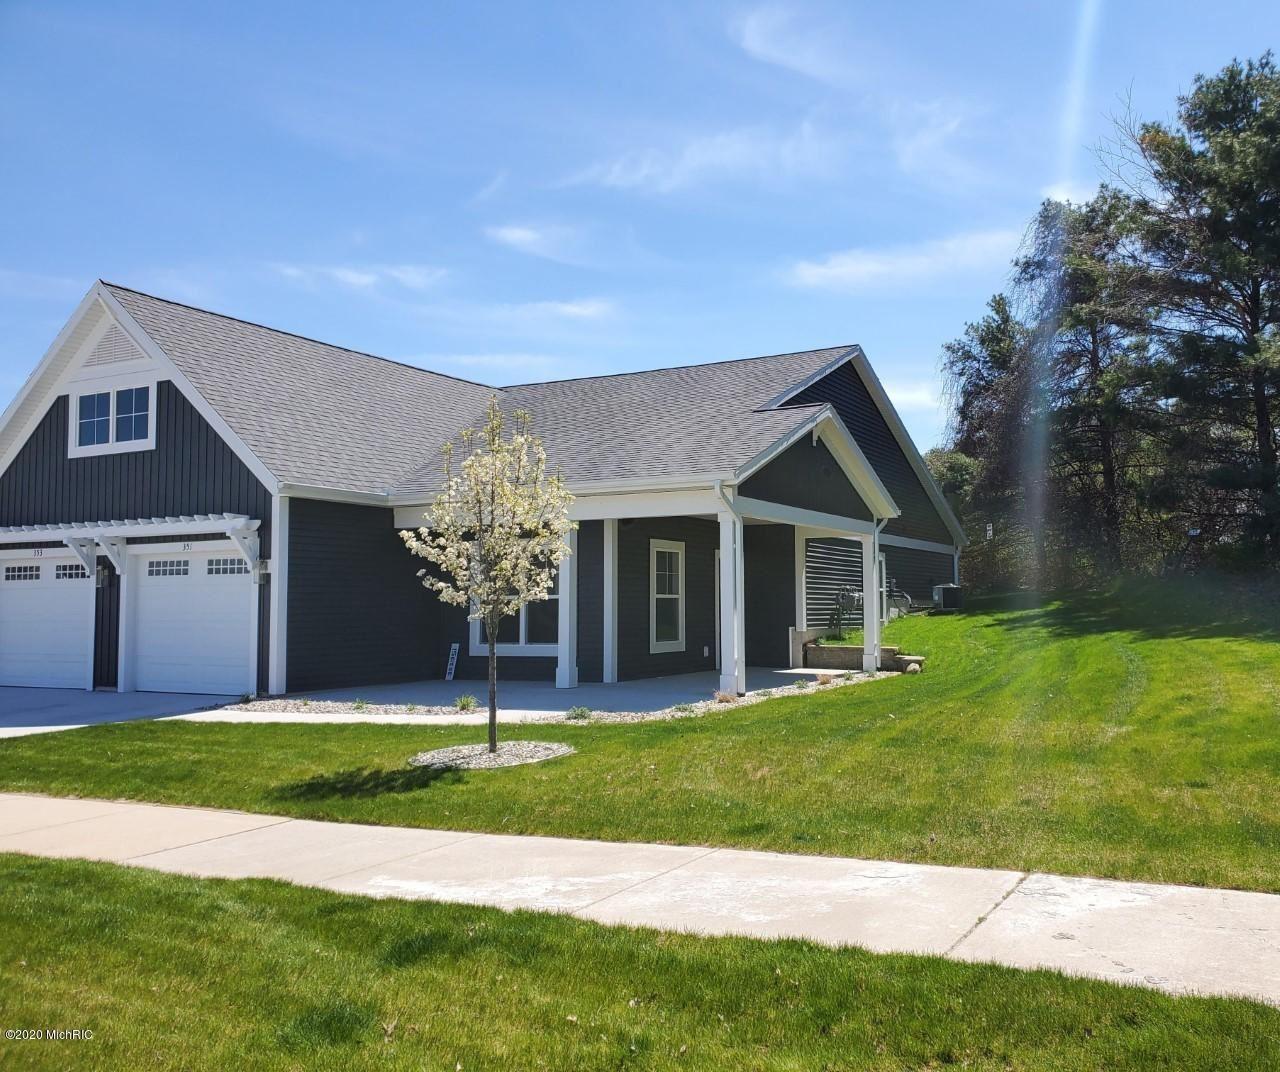 351 Terrace Point Circle #Site 16, Muskegon, MI 49440 - MLS#: 20003834